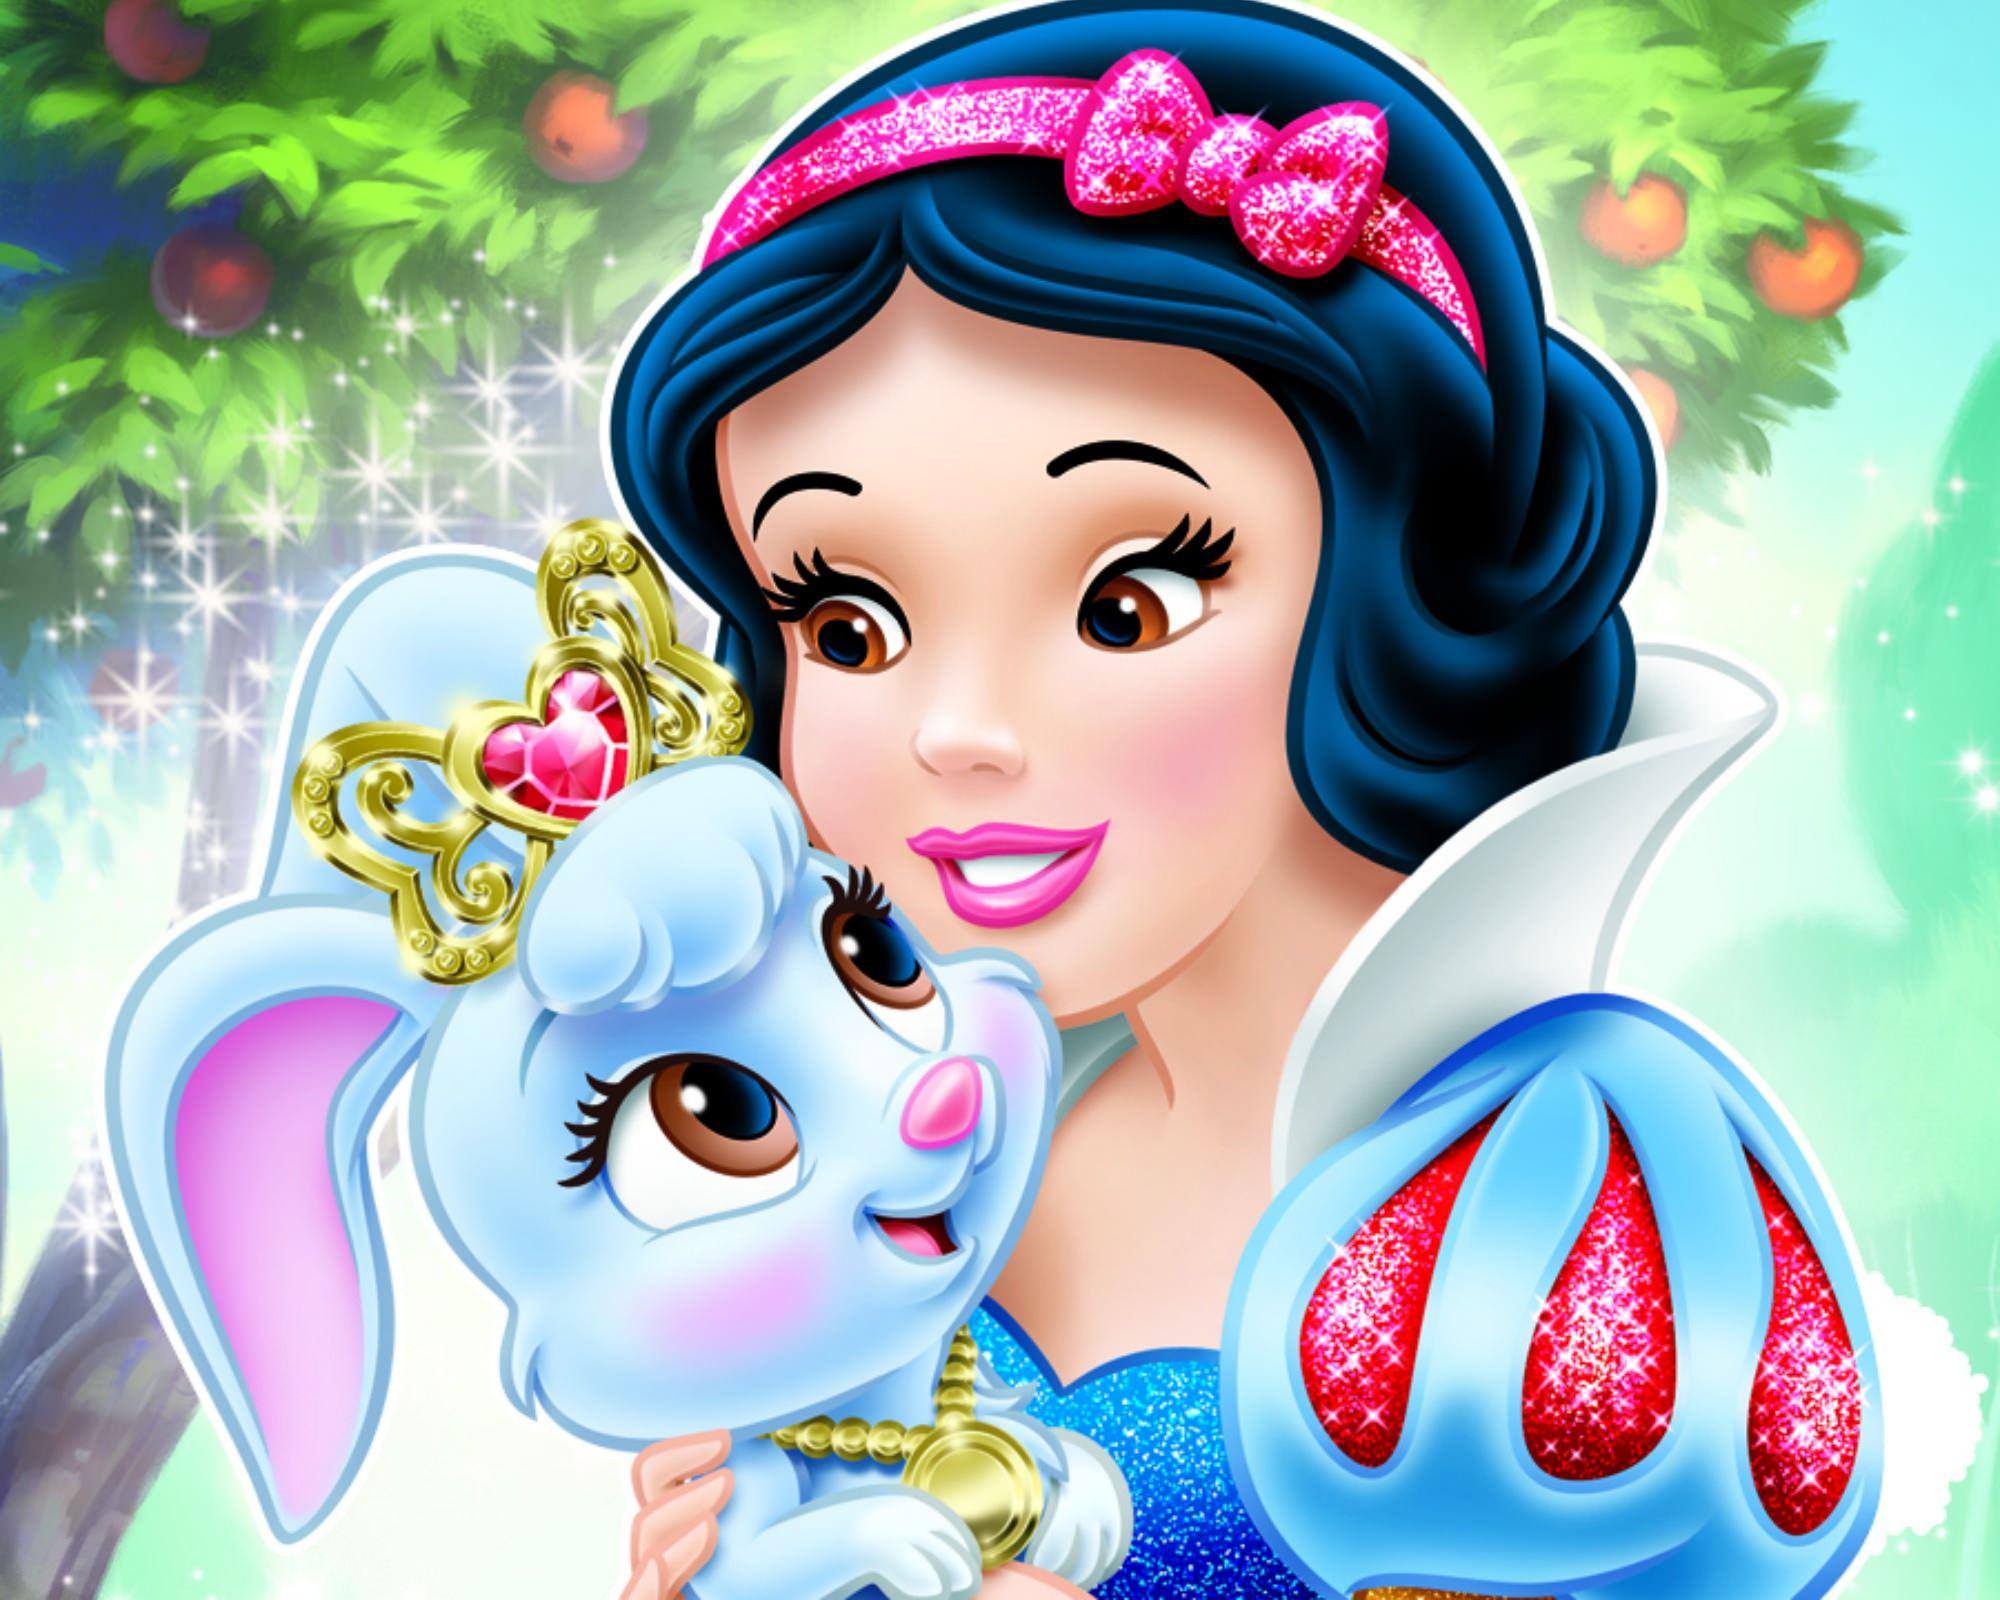 Berry & Snow White Disney Wallpaper